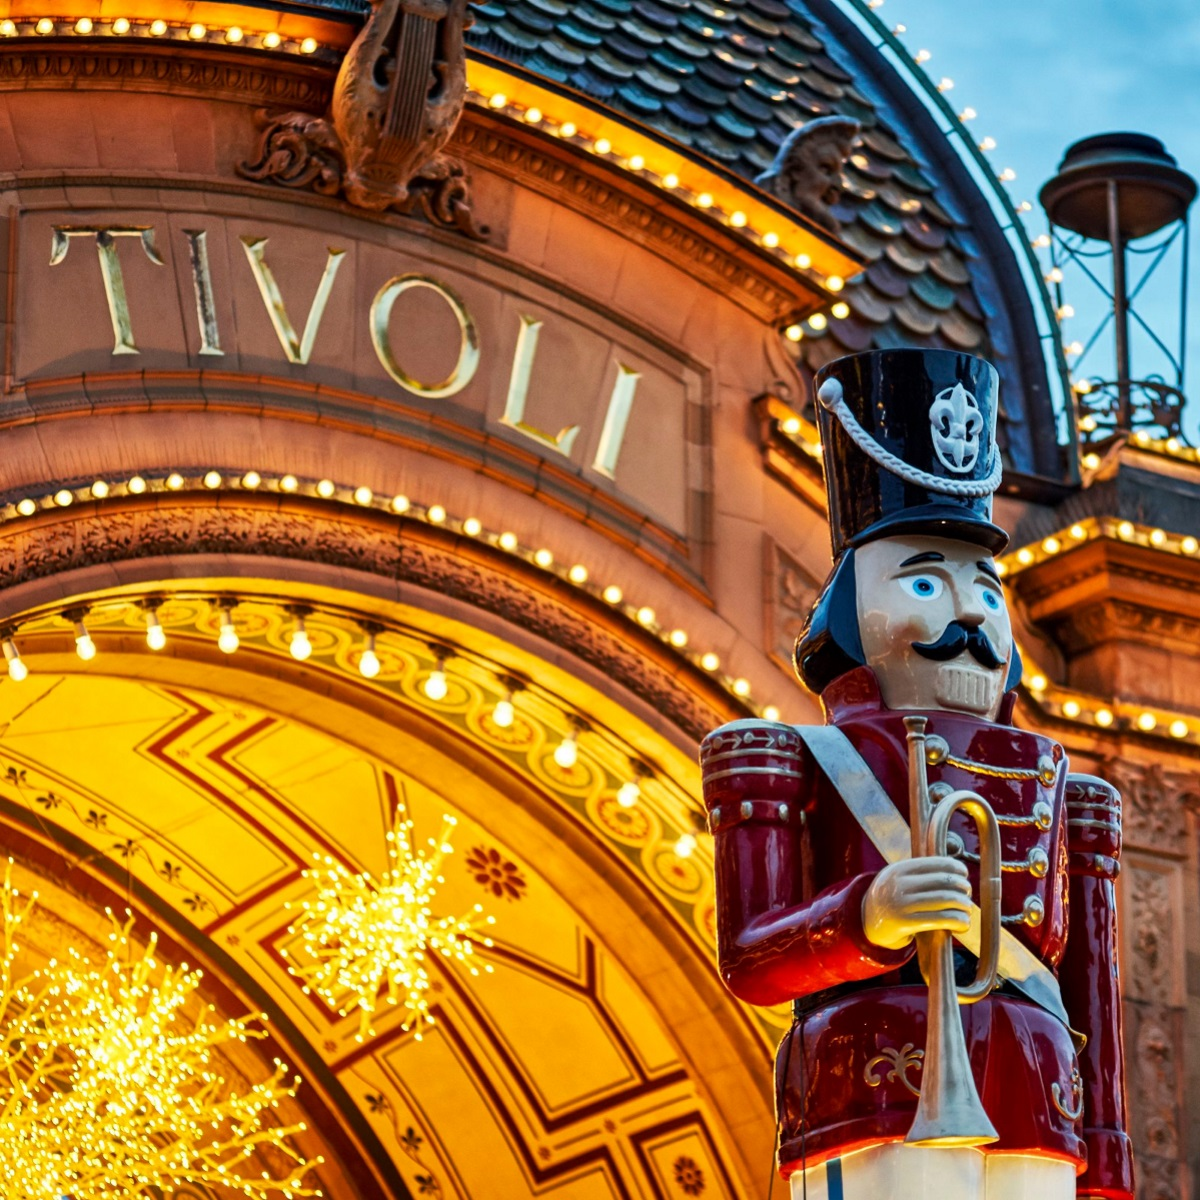 Weihnachten im Tivoli Kopenhagen 3